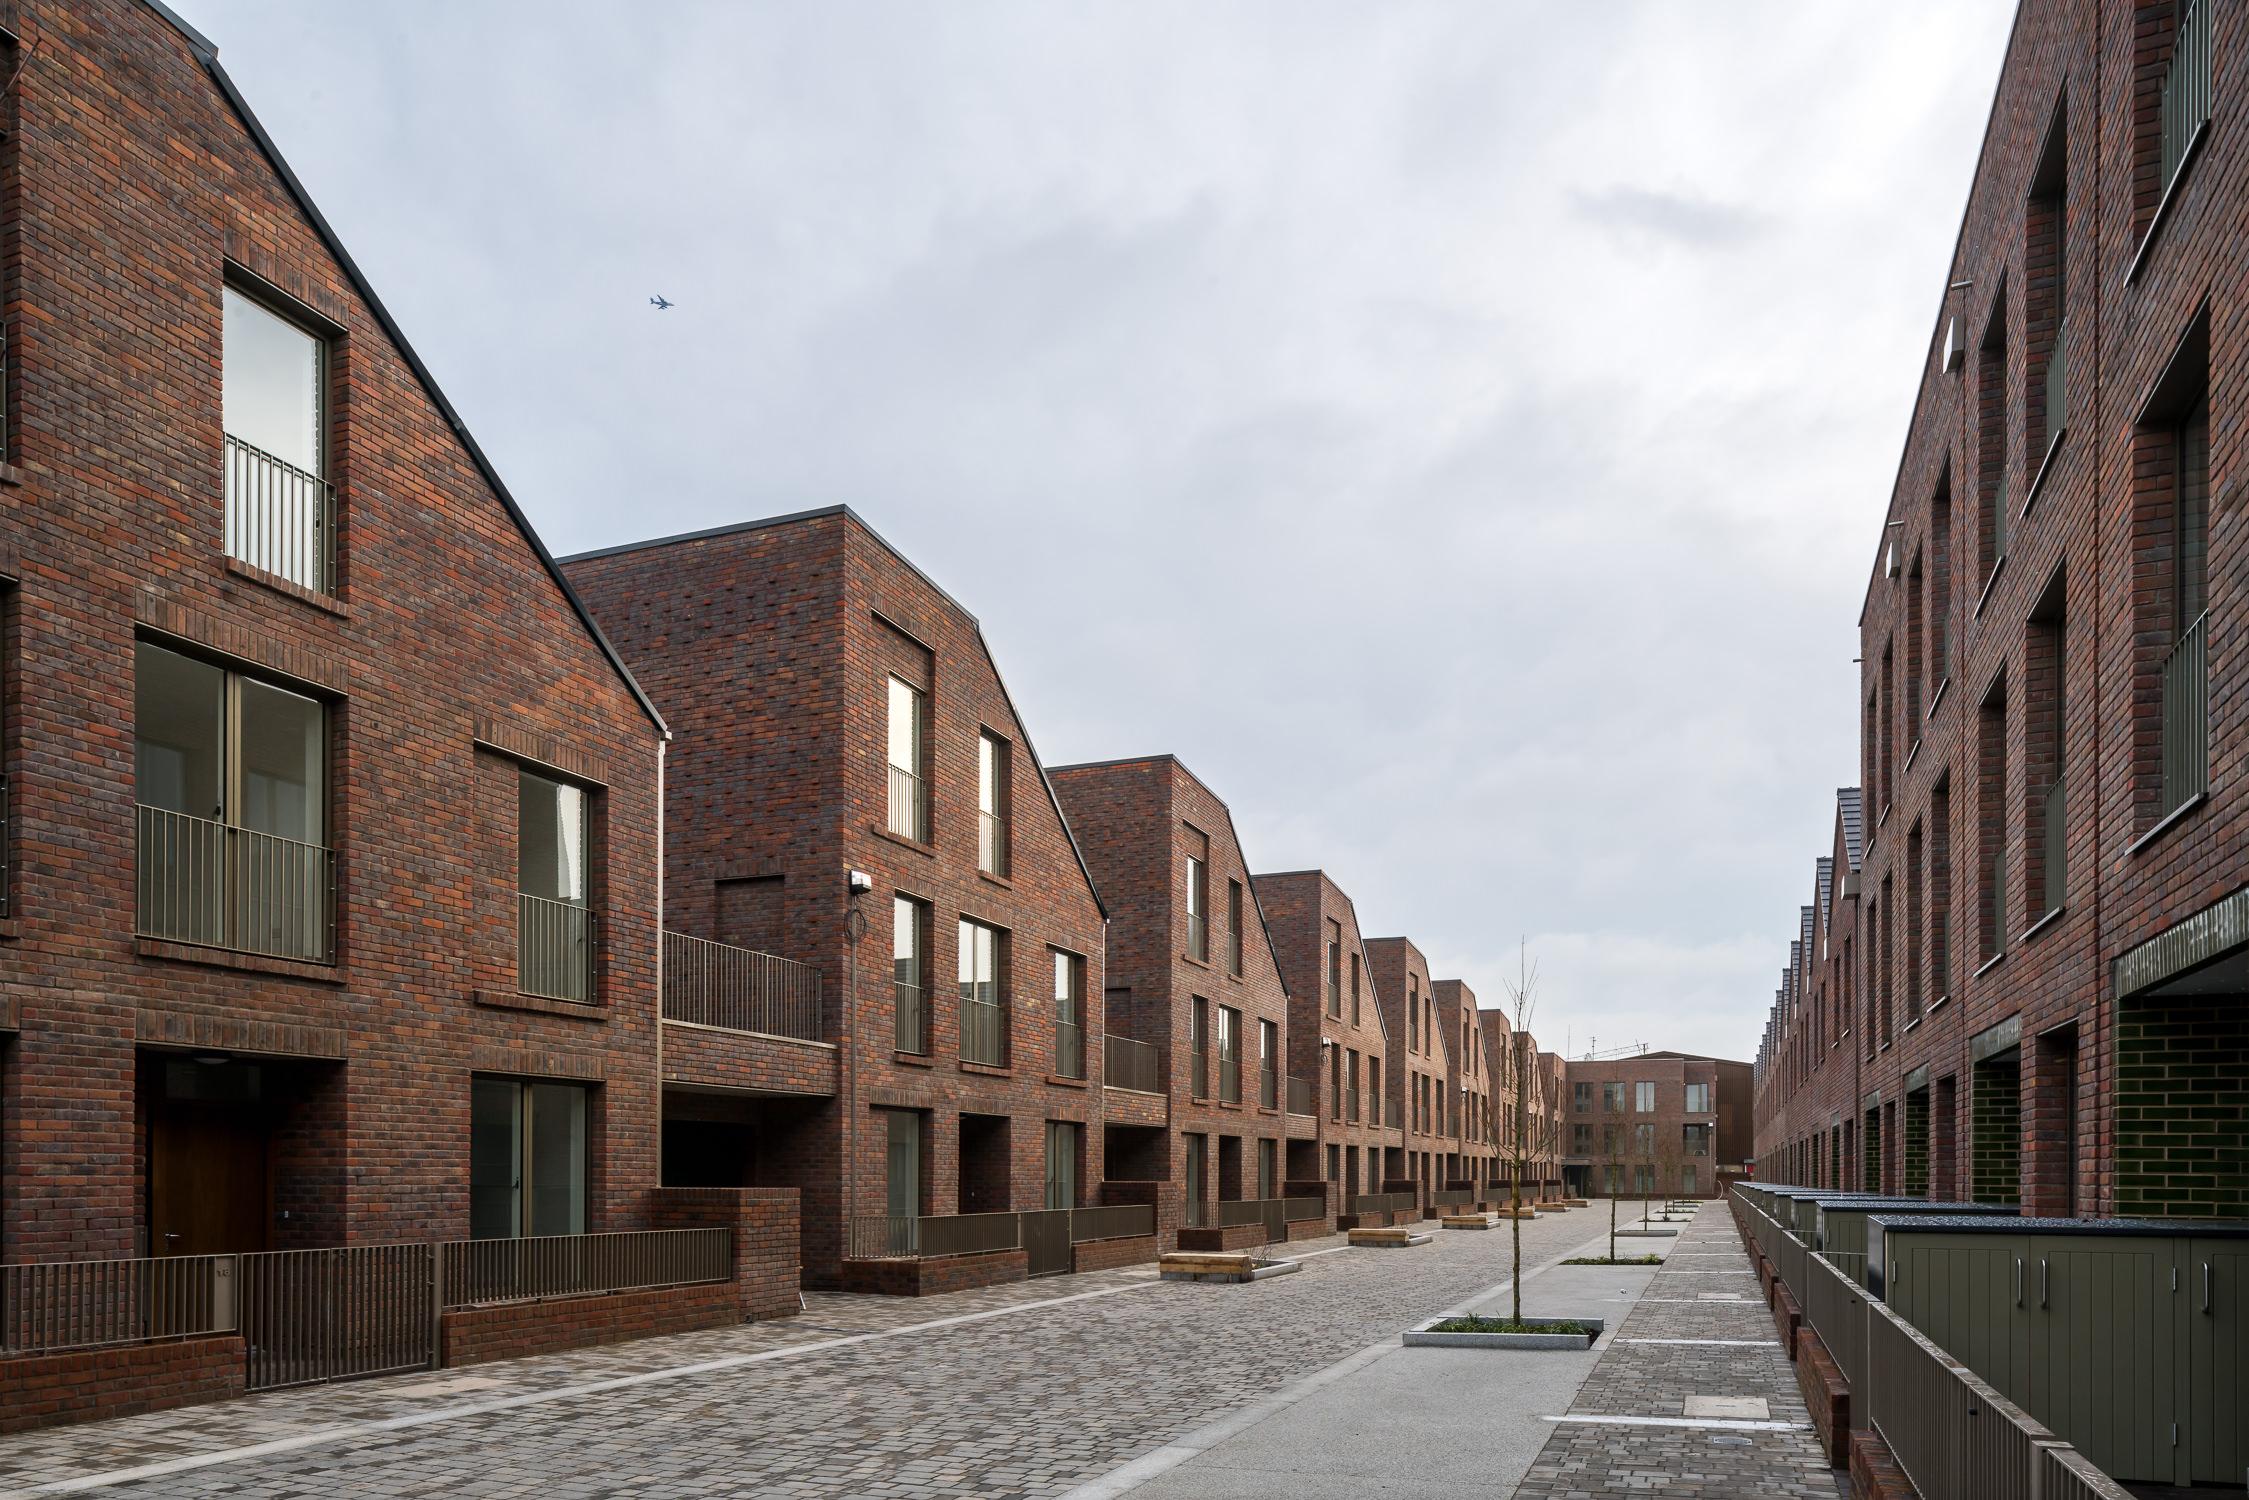 mark-hadden-architecture-photographer-architectuur-interieur-fotografie-london-amsterdam-Dujardin Mews-019.jpg